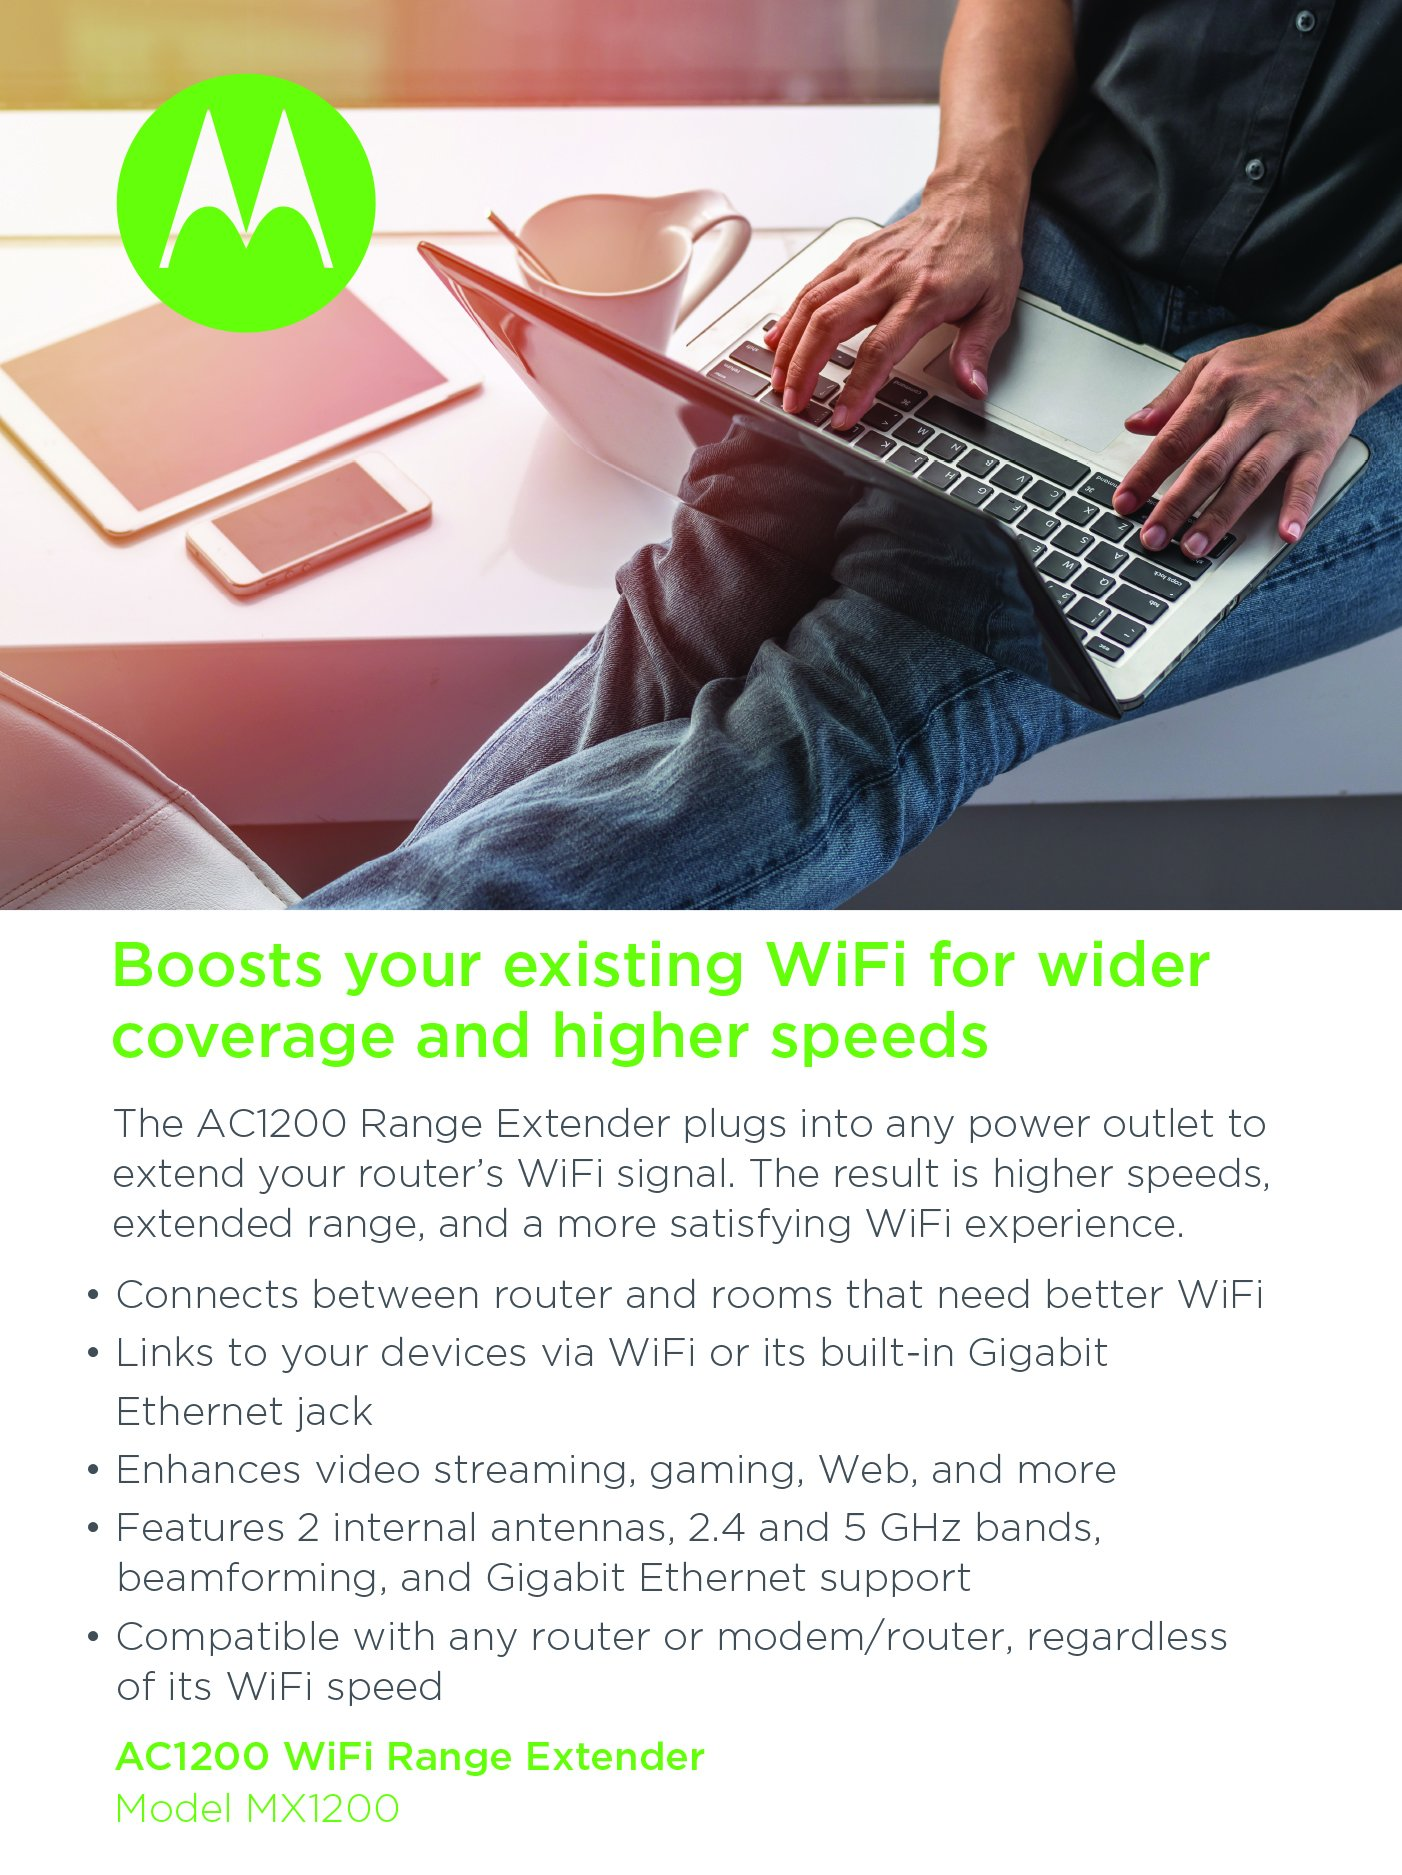 MOTOROLA AC1200 WiFi Range Extender with Gigabit Ethernet, Dual Band, Model MX1200 by Motorola (Image #5)